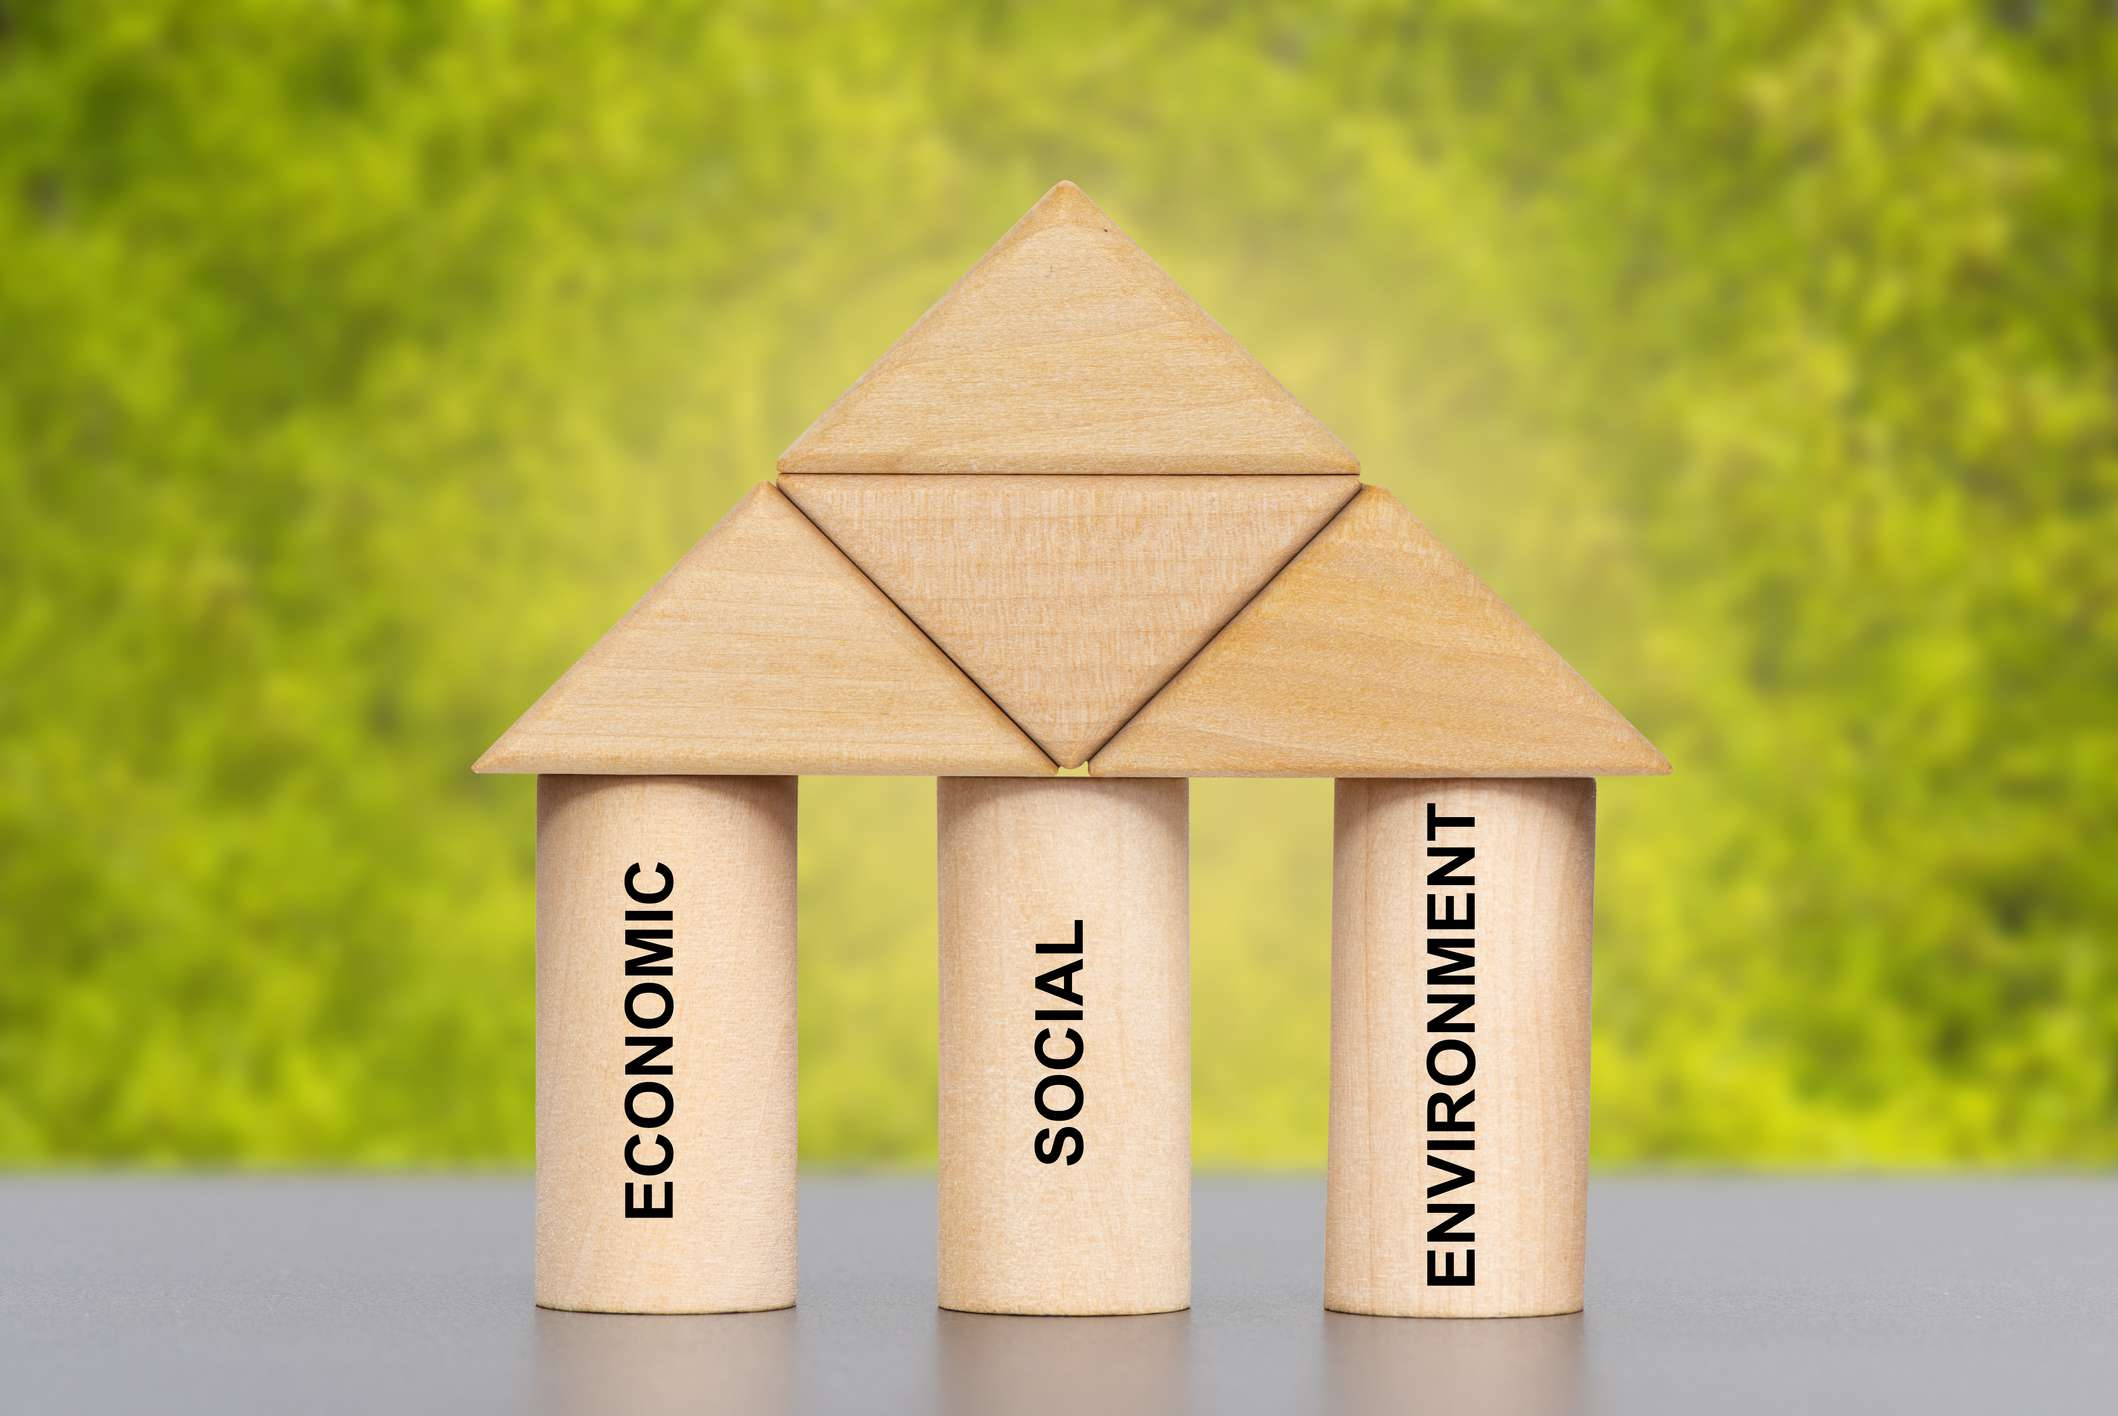 Building blocks shaped into three pillars labeled economic, social, and environment.